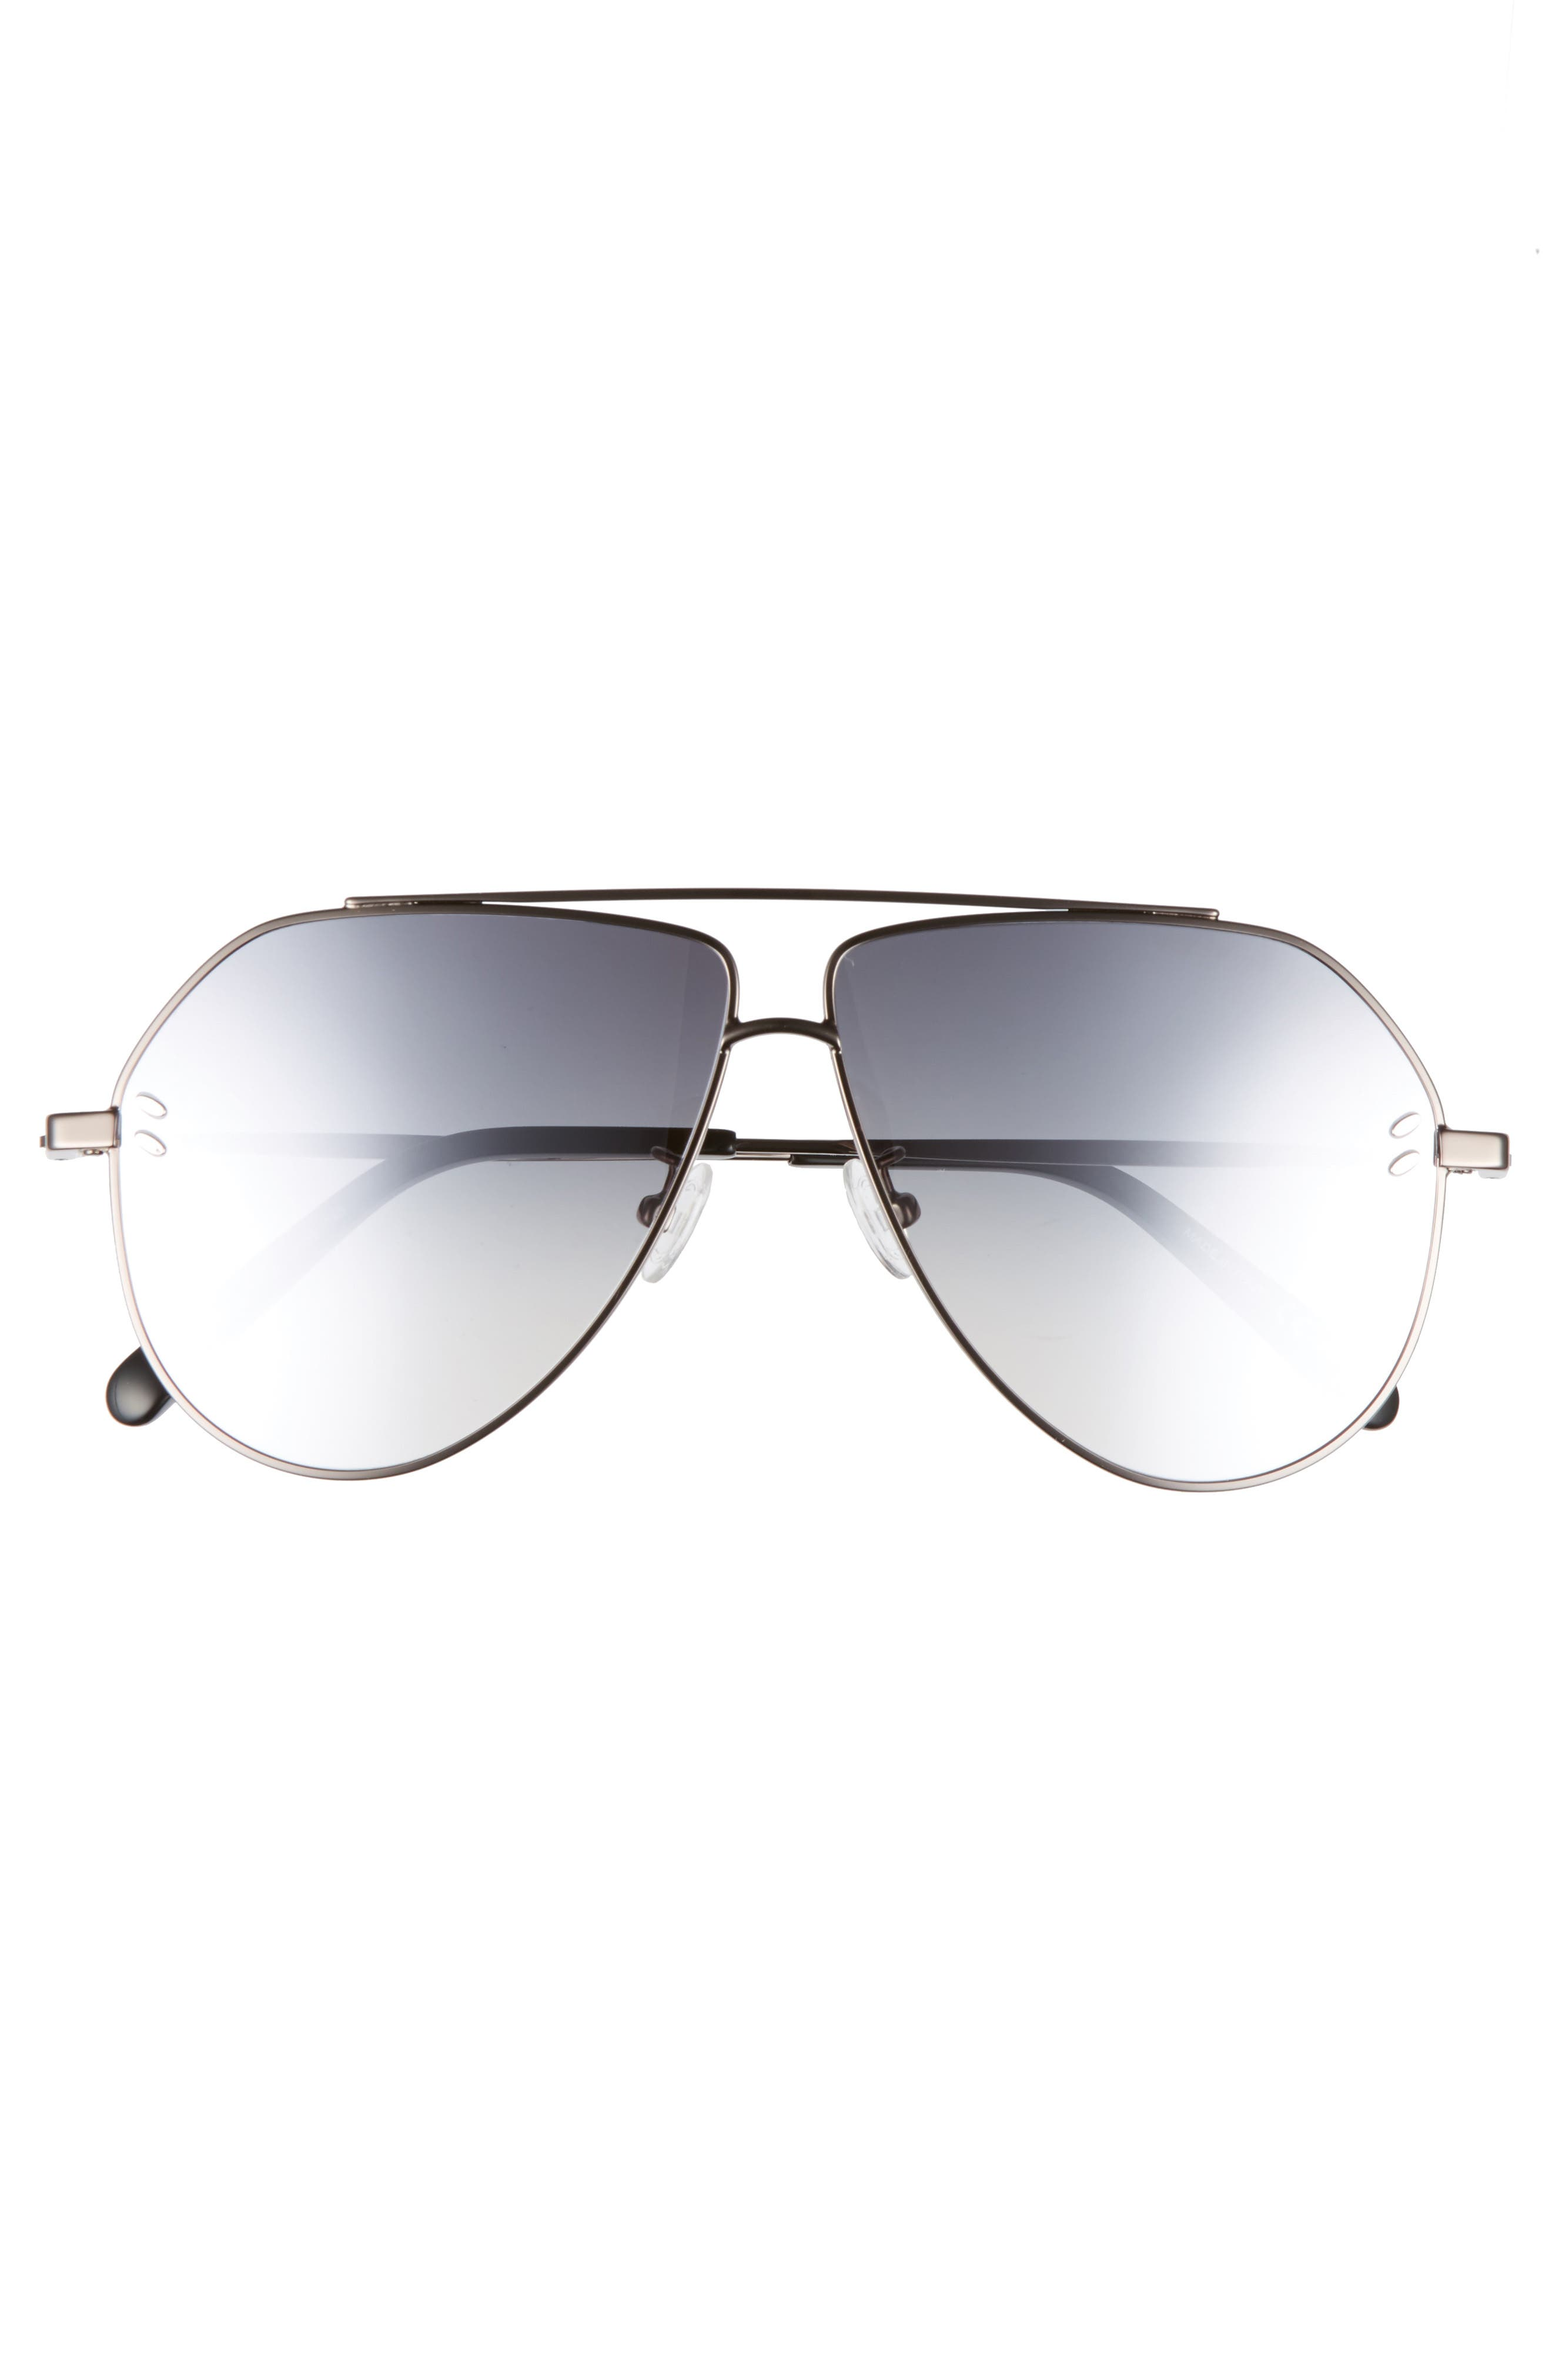 60mm Aviator Sunglasses,                             Alternate thumbnail 3, color,                             040